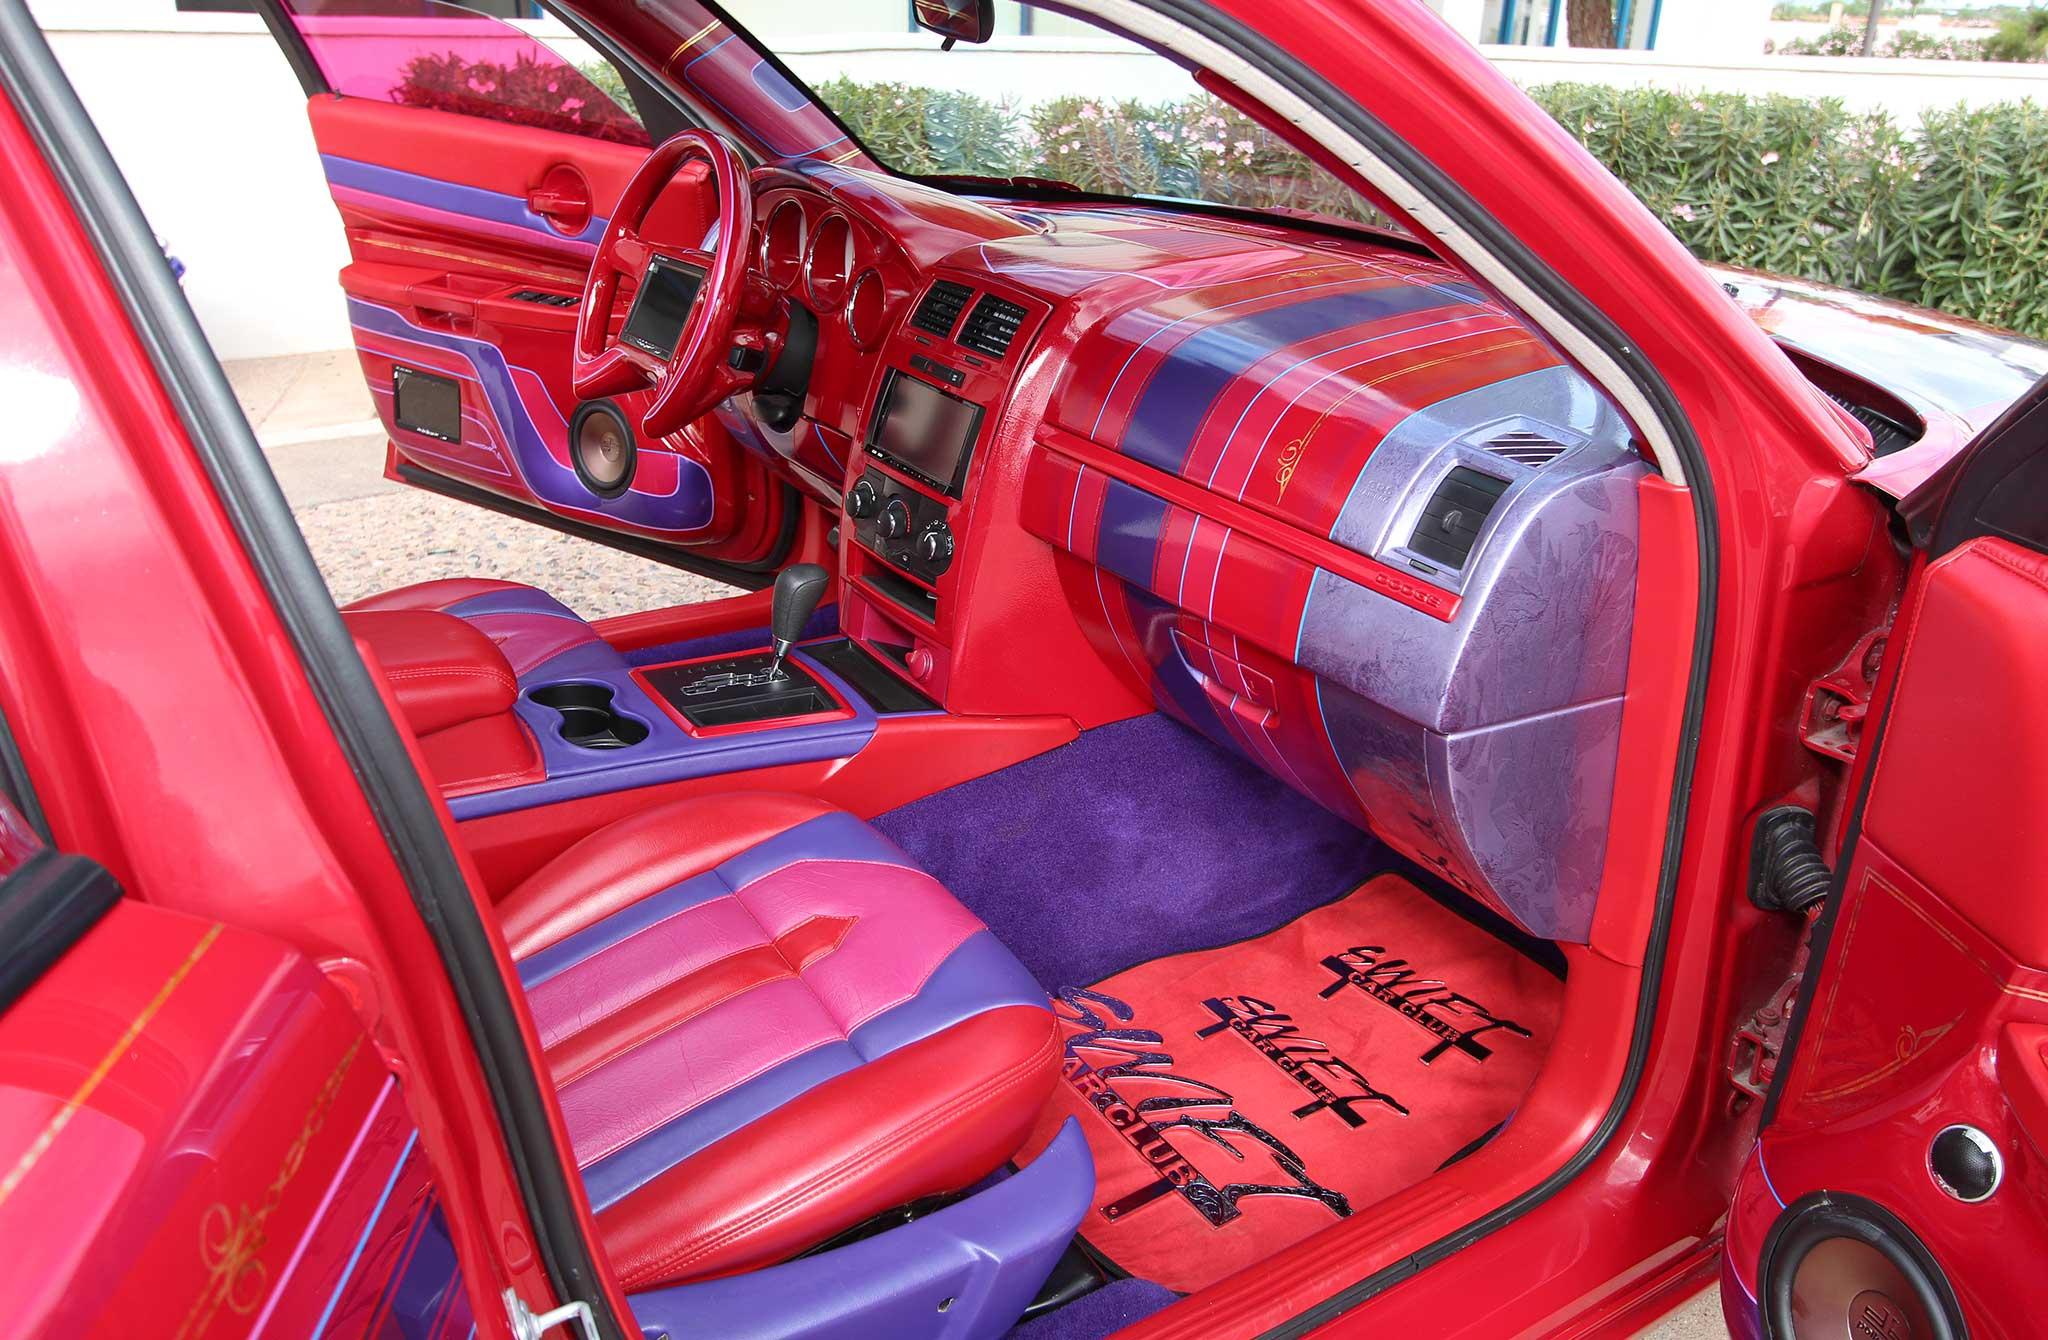 2008 Dodge Charger Custom Interior1 Lowrider